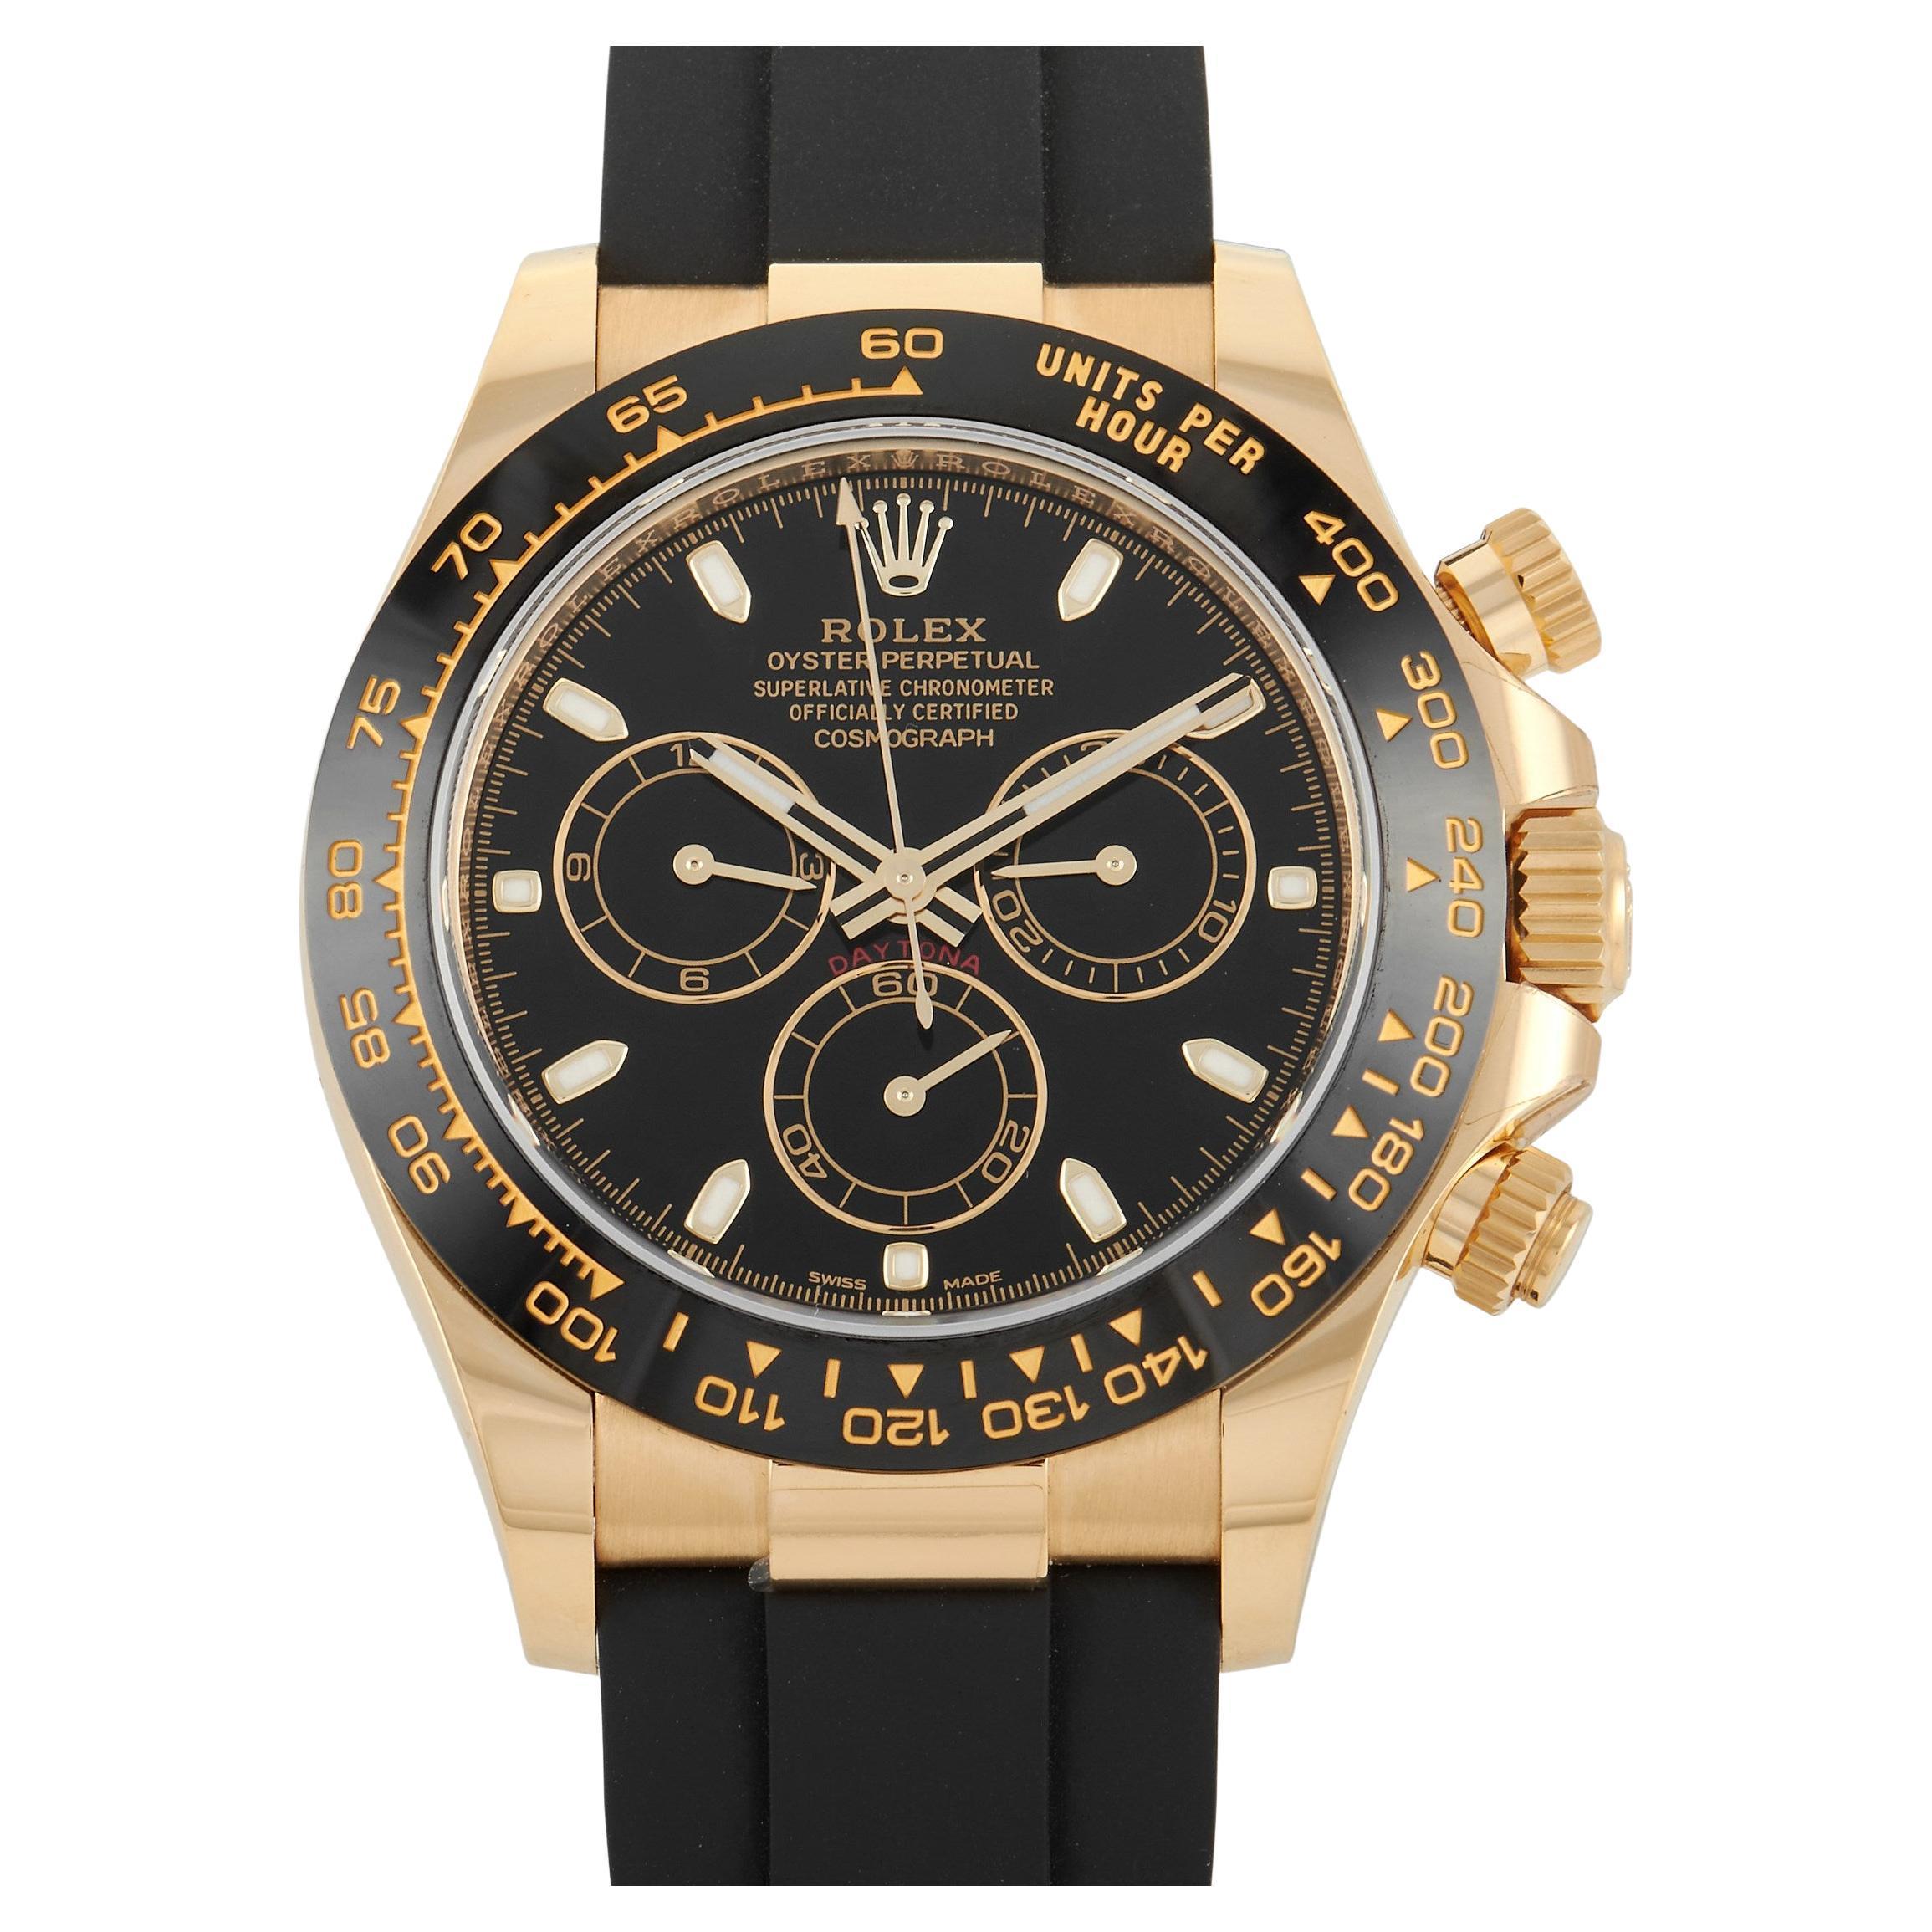 Rolex Cosmograph Daytona Yellow Gold Watch 116518LN